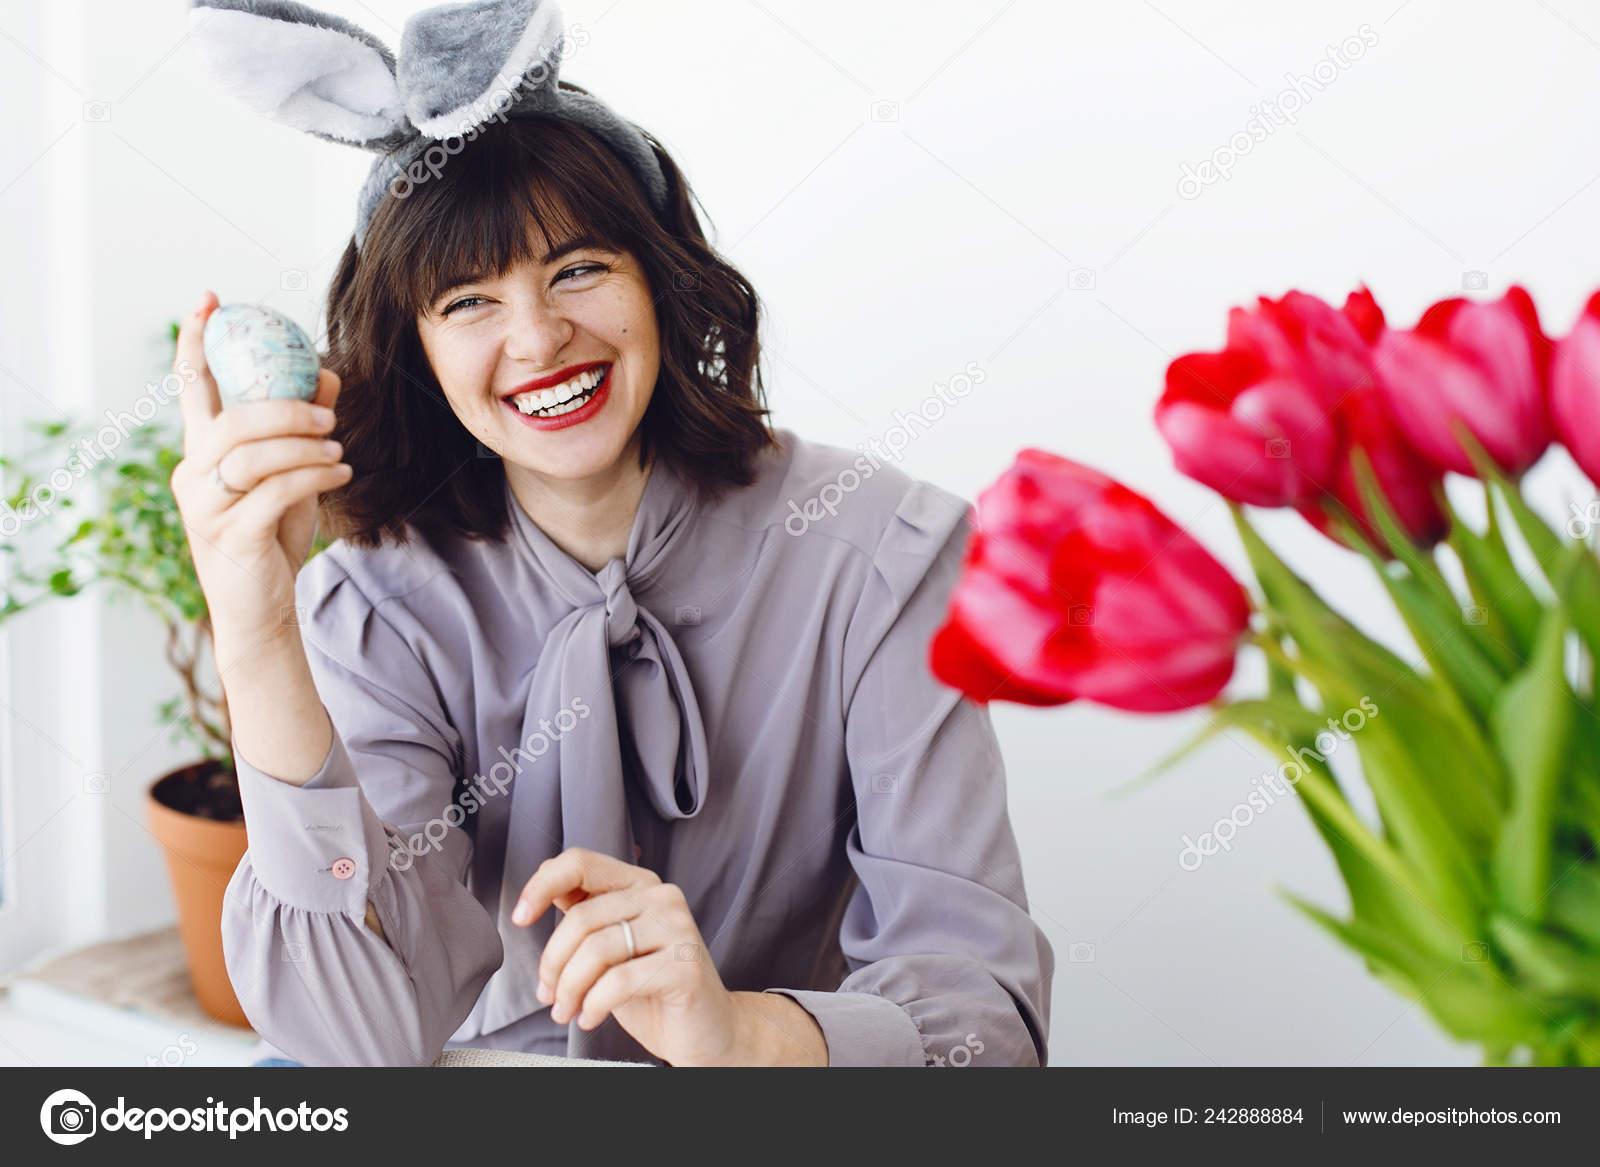 Аней минет, девушки за яйца